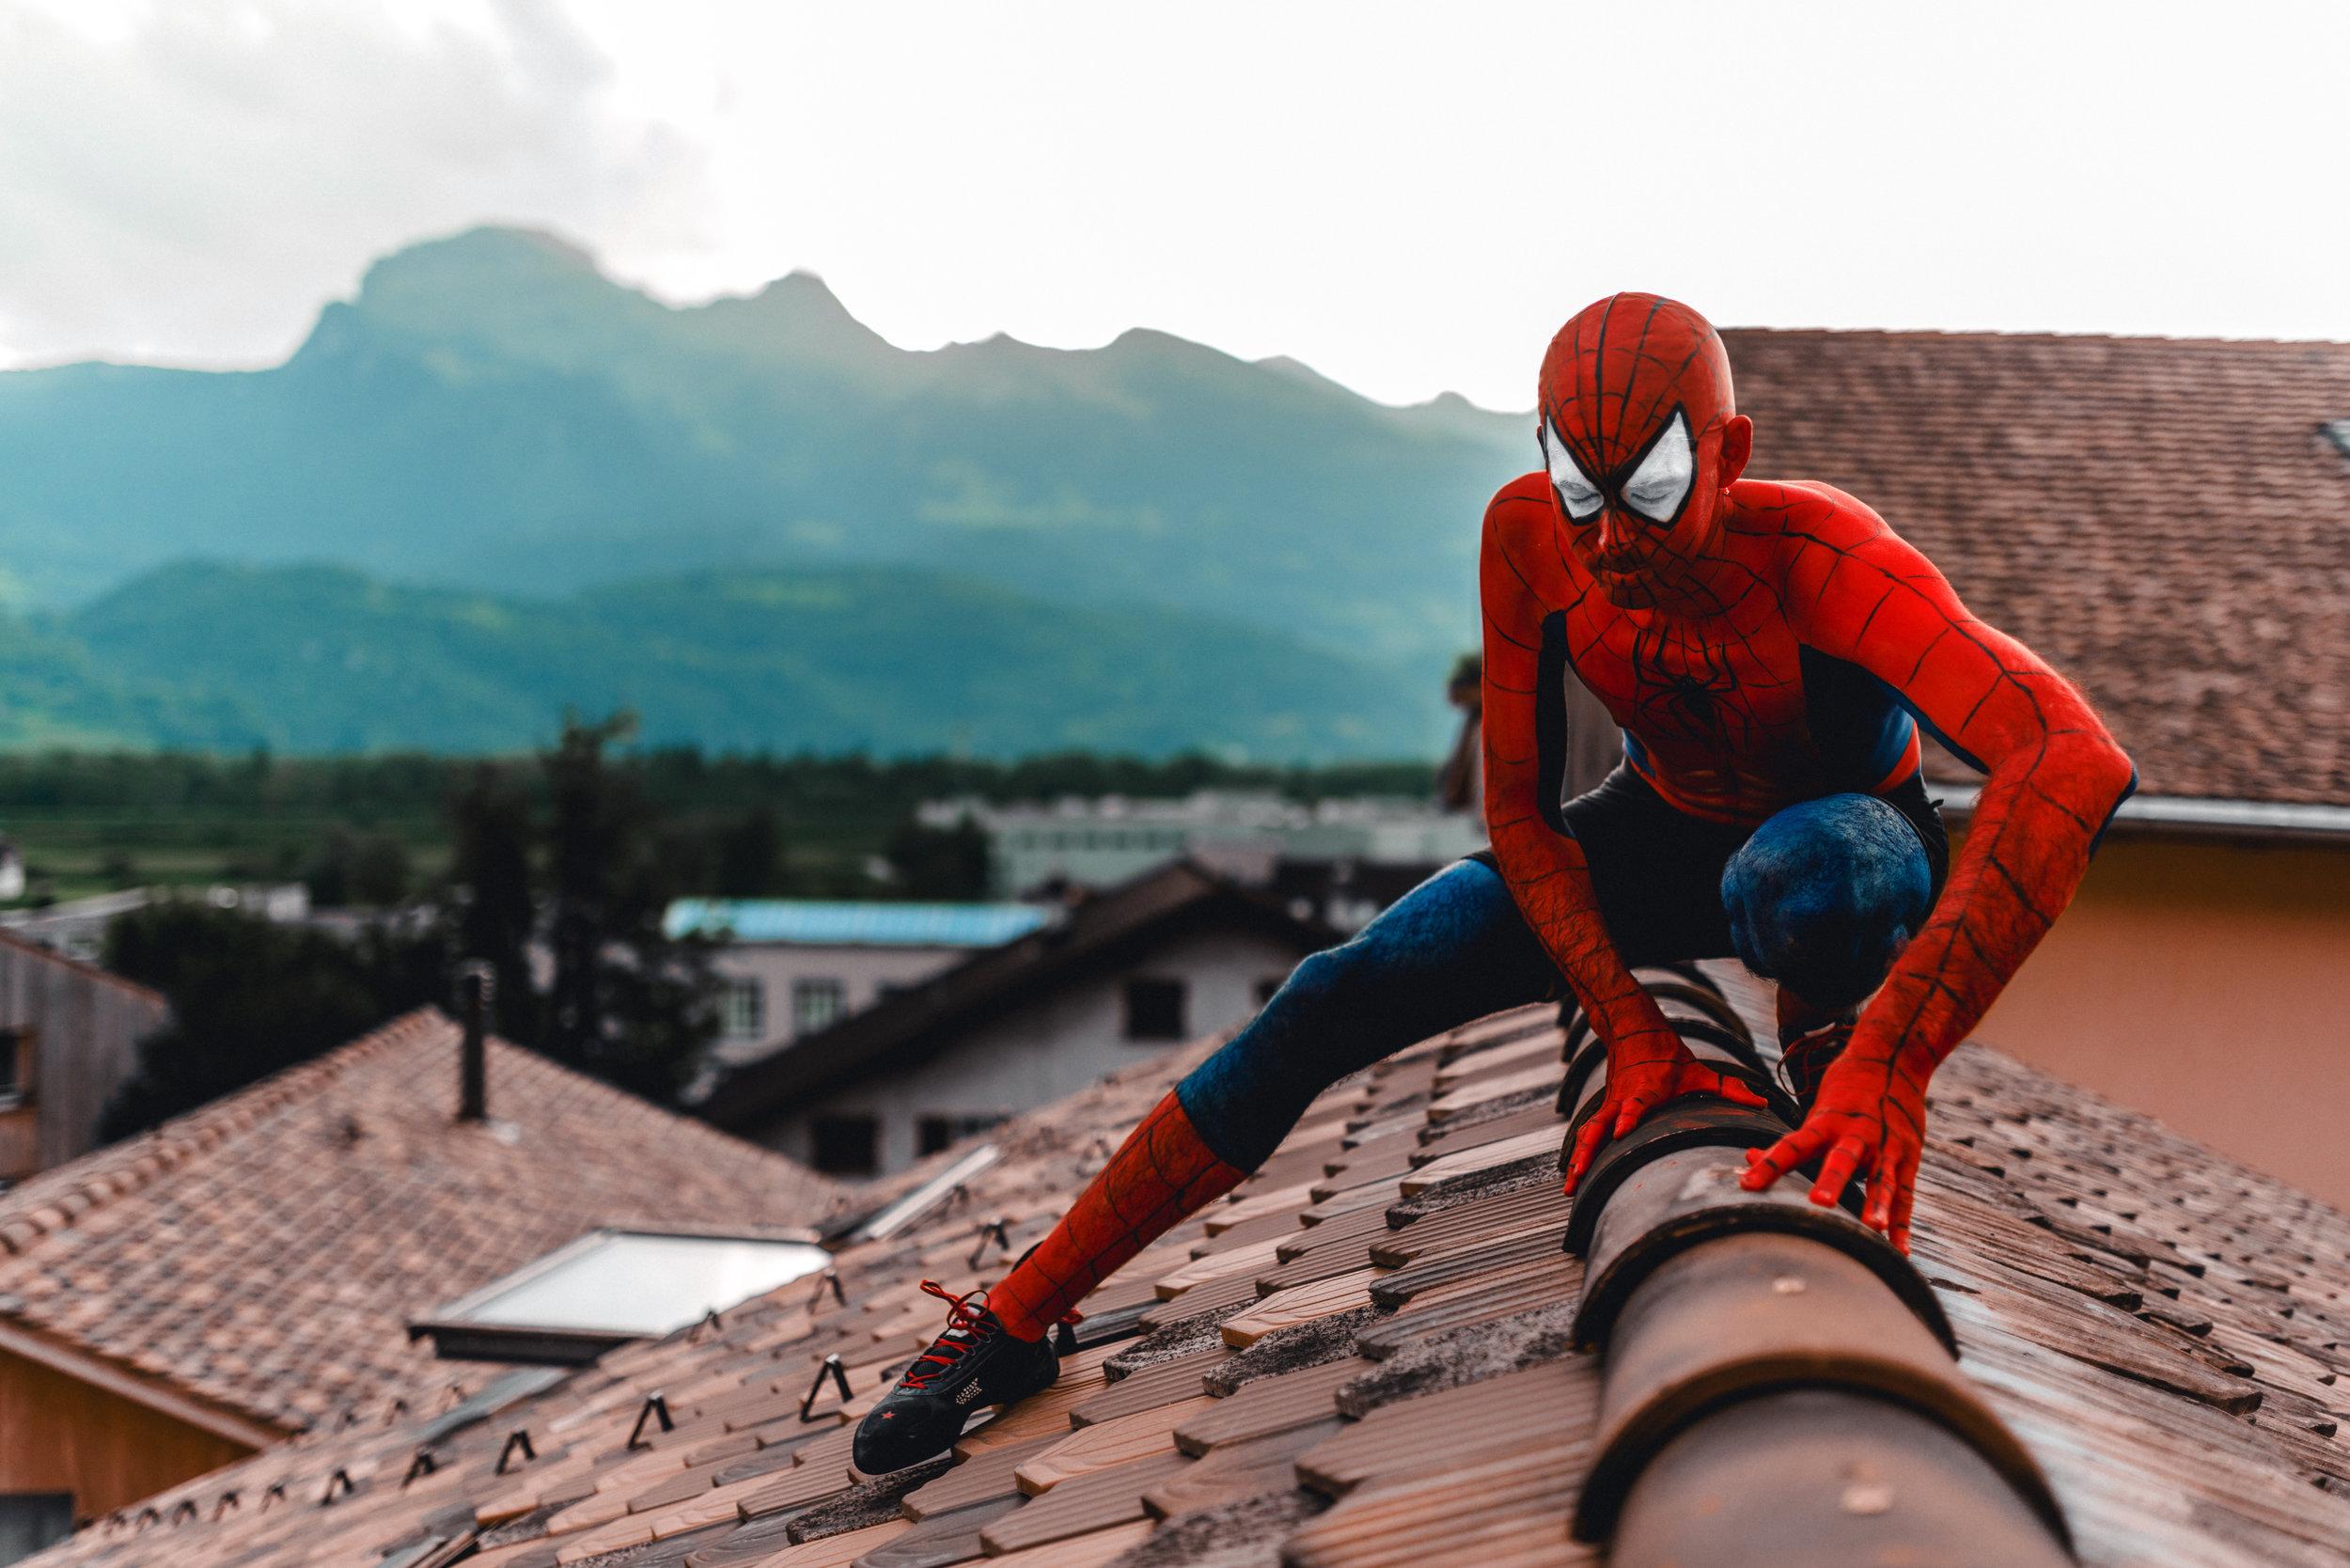 20170826_Spiderman_33.jpg